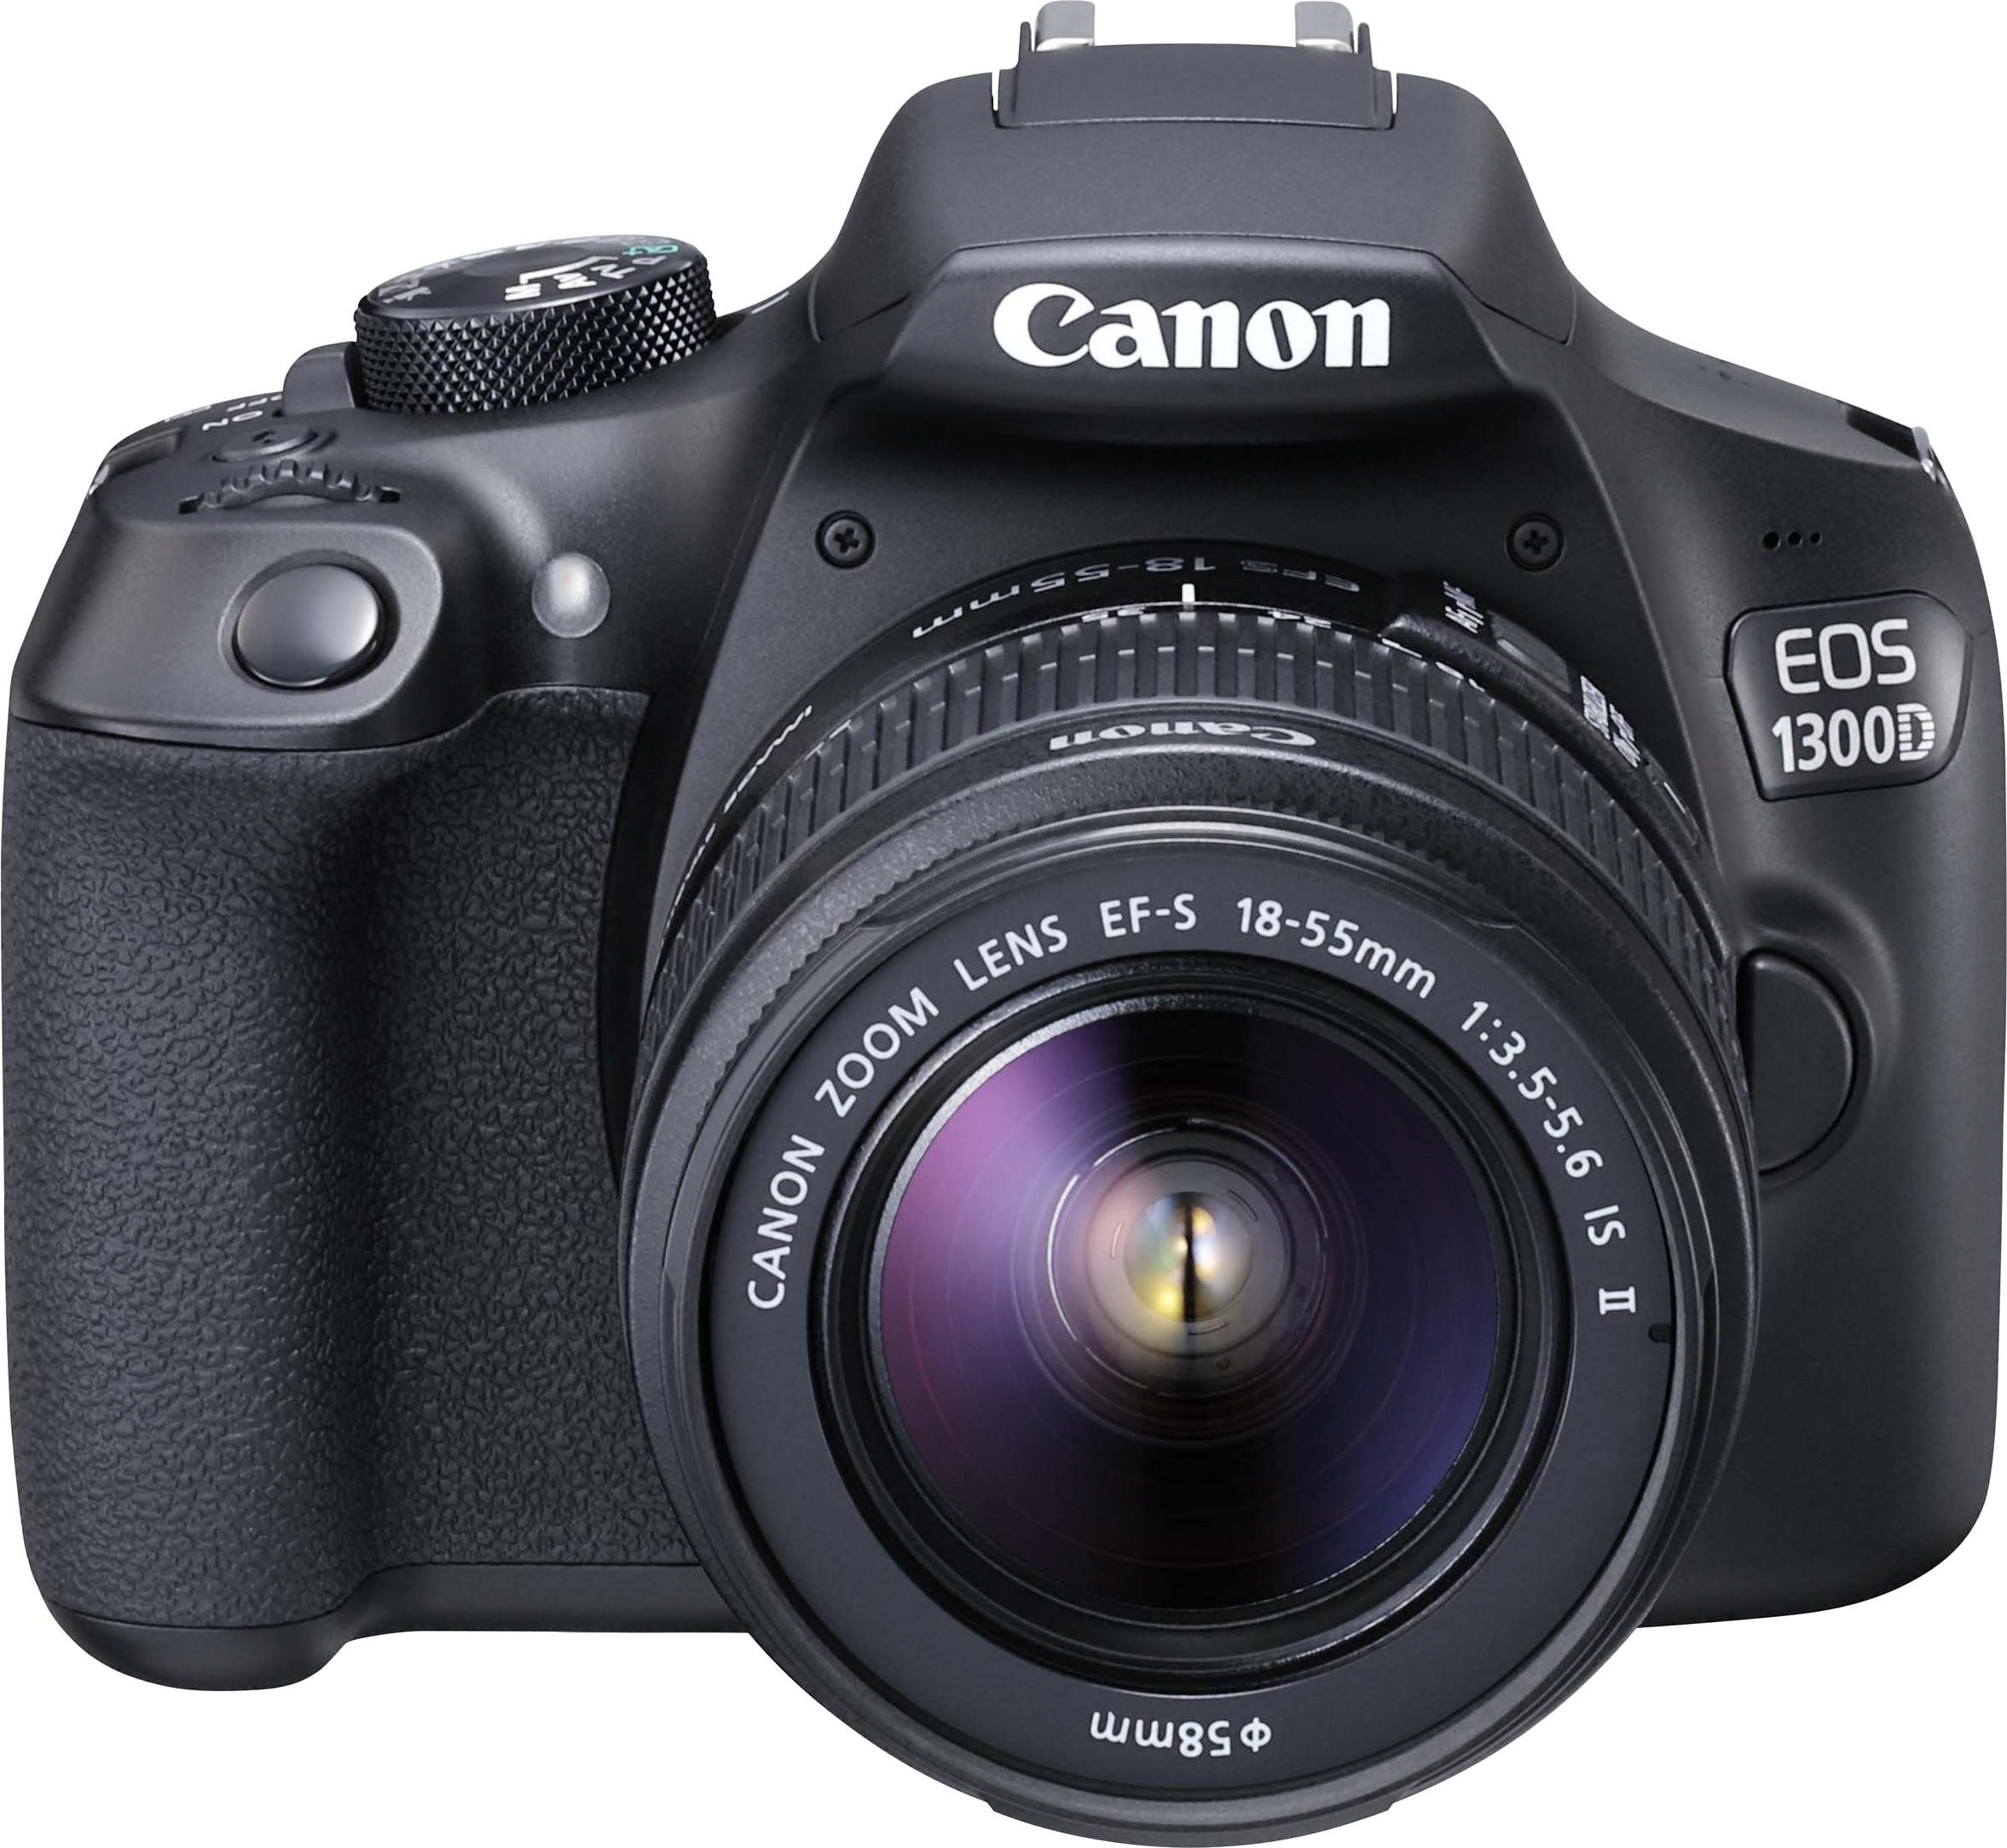 Canon EOS 1300D DSLR Camera Image